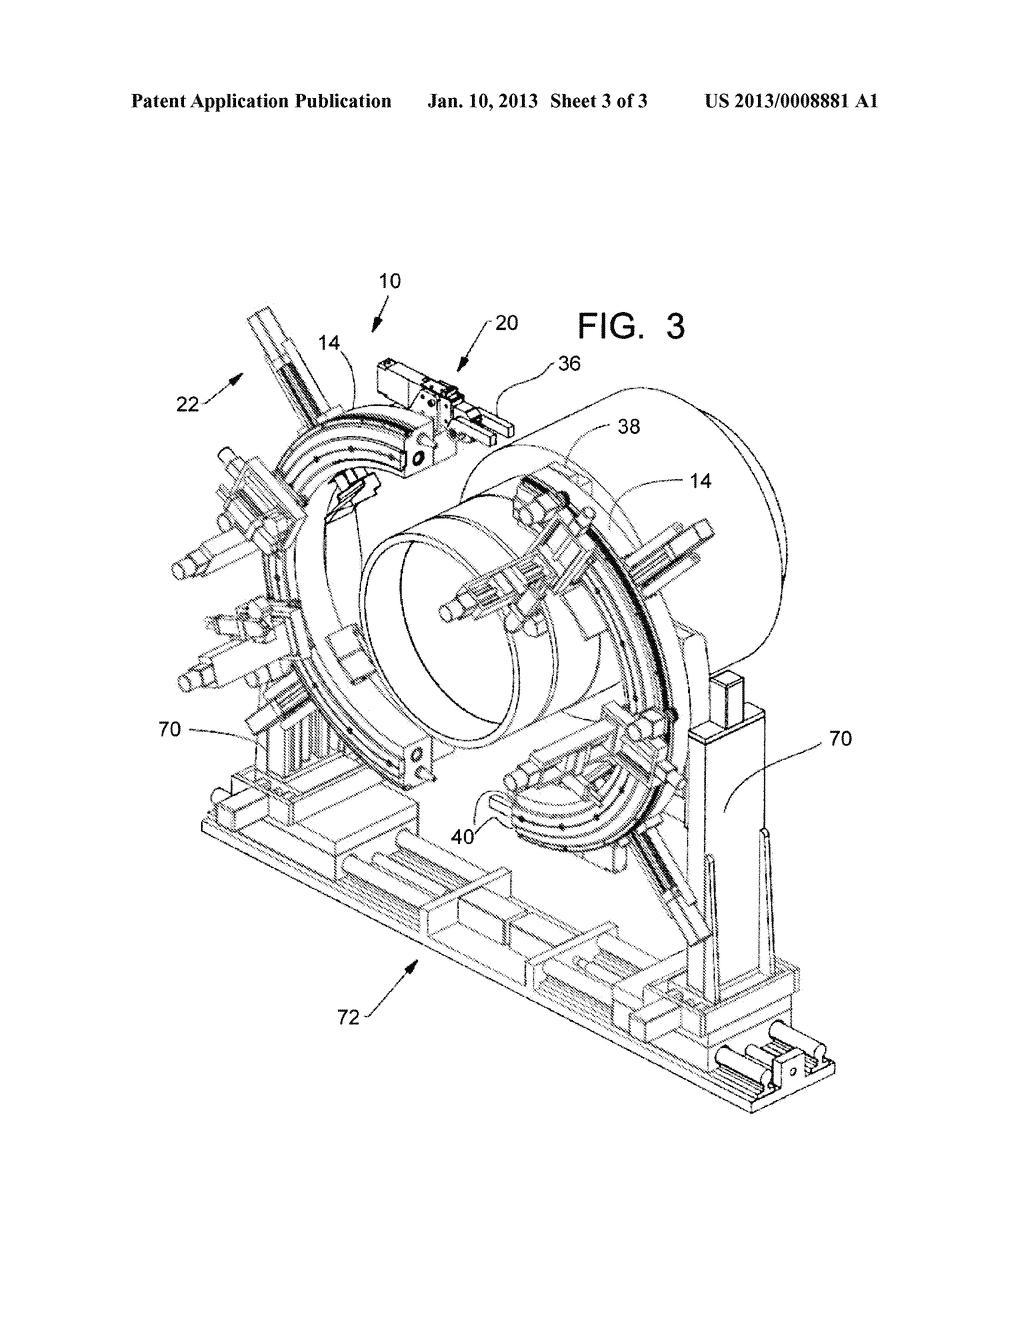 Orbital Welding Apparatus Diagram Schematic And Image 04 Of